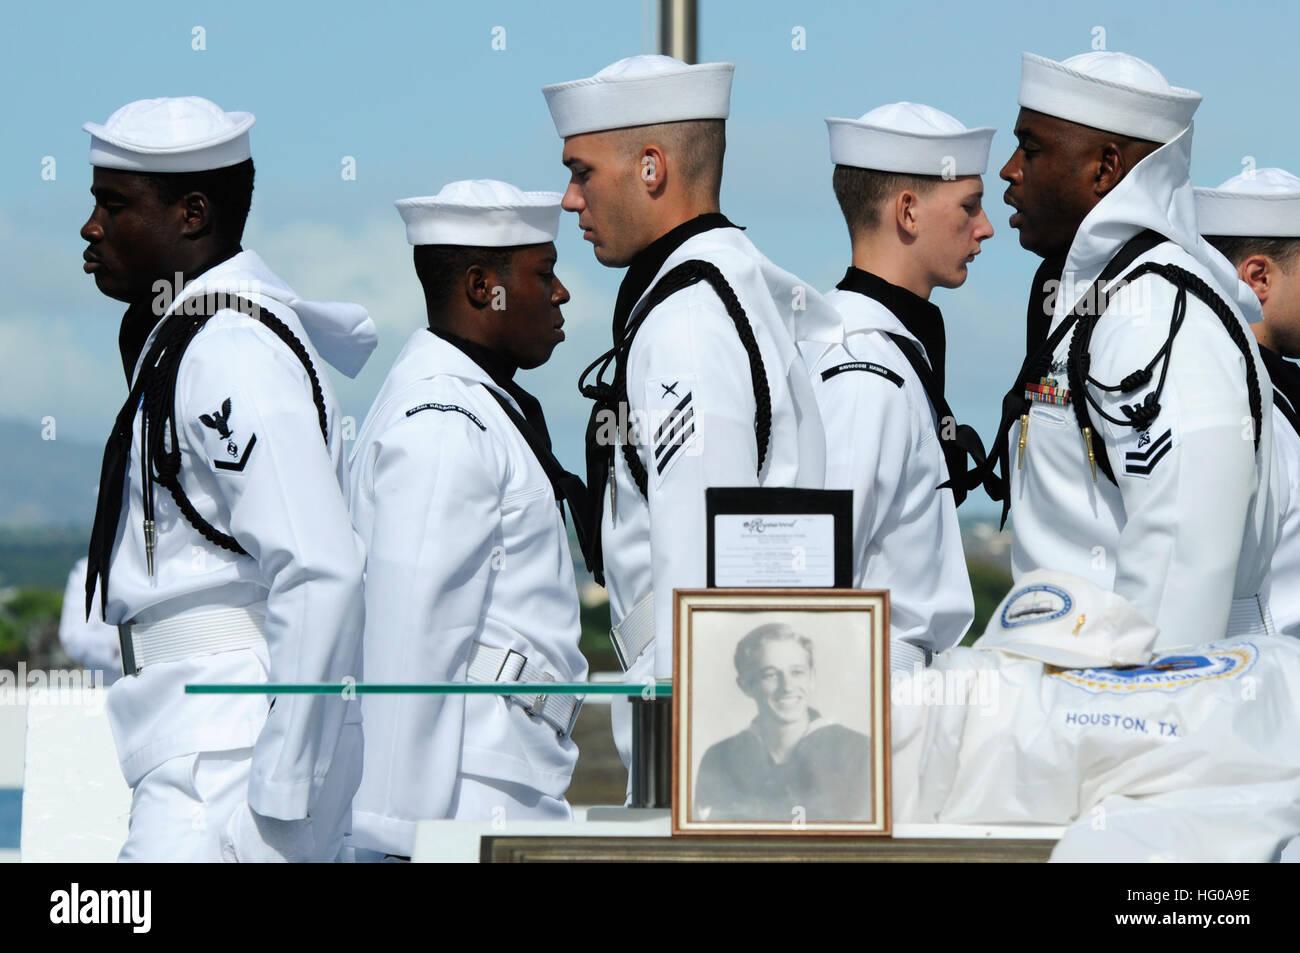 111205-N-WP748-246 JOINT BASE PEARL HARBOR-HICKAM (Dec. 5, 2011) Sailors assigned to Joint Base Pearl Harbor-Hickam - Stock Image